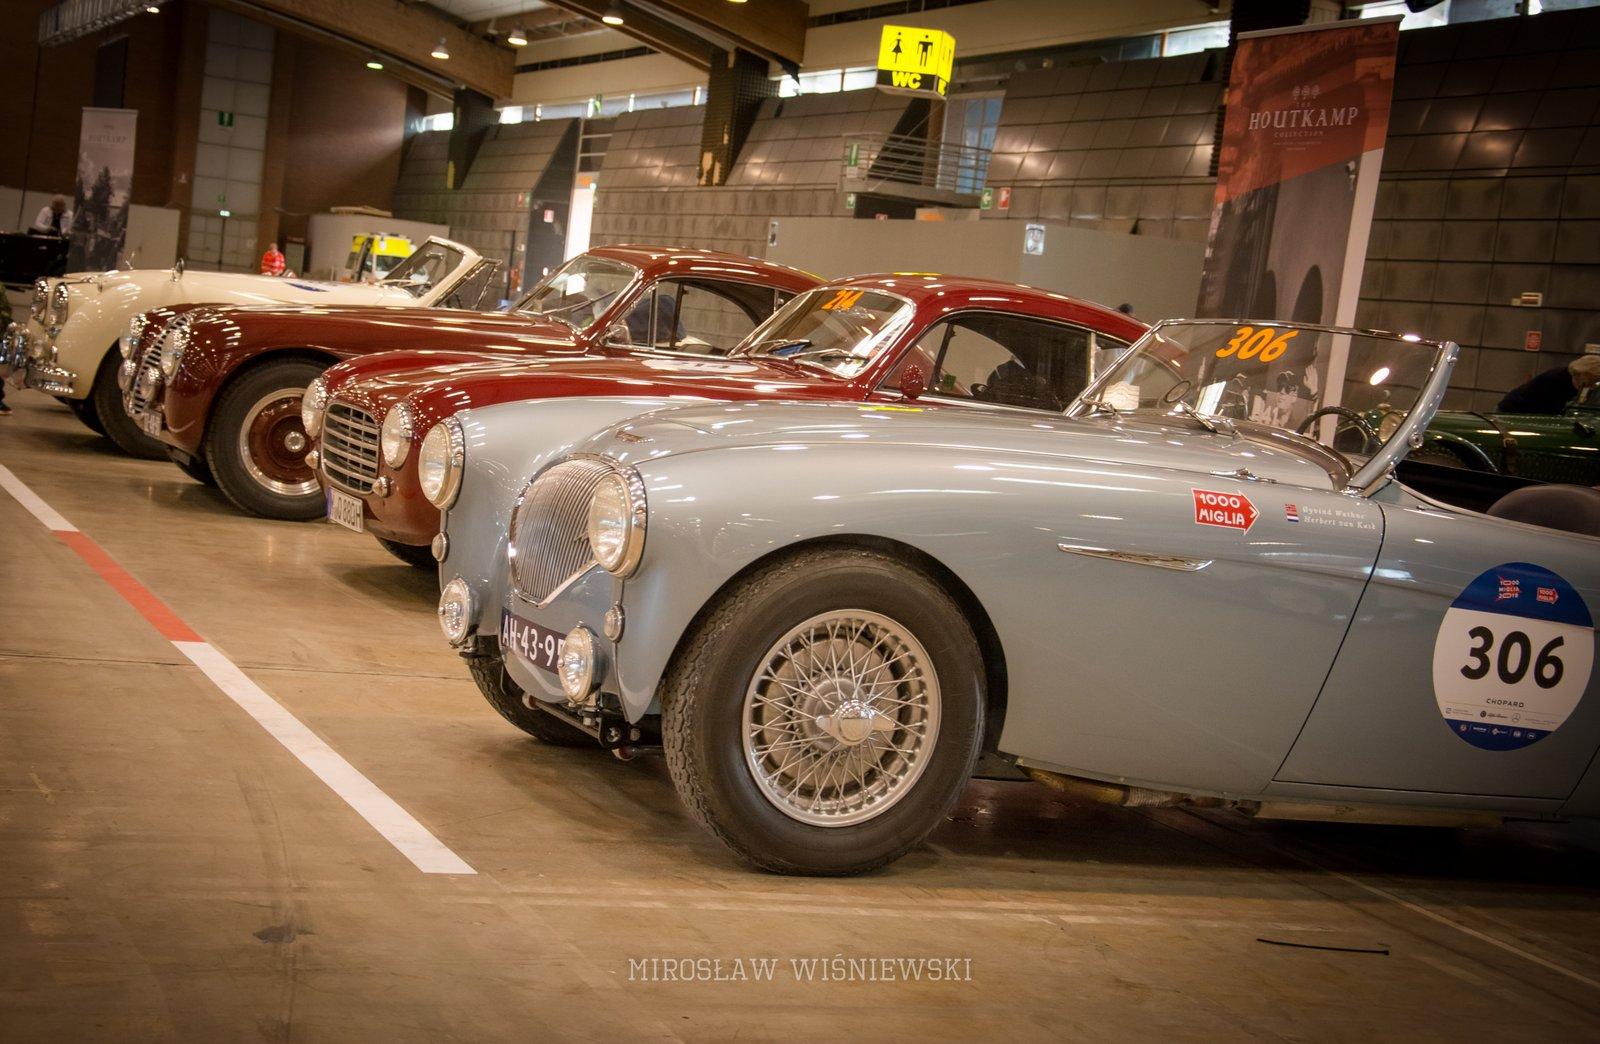 Mille Miglia 2019, Brescia, 100 Migilia, Miroslaw Wisniewski Fotografia